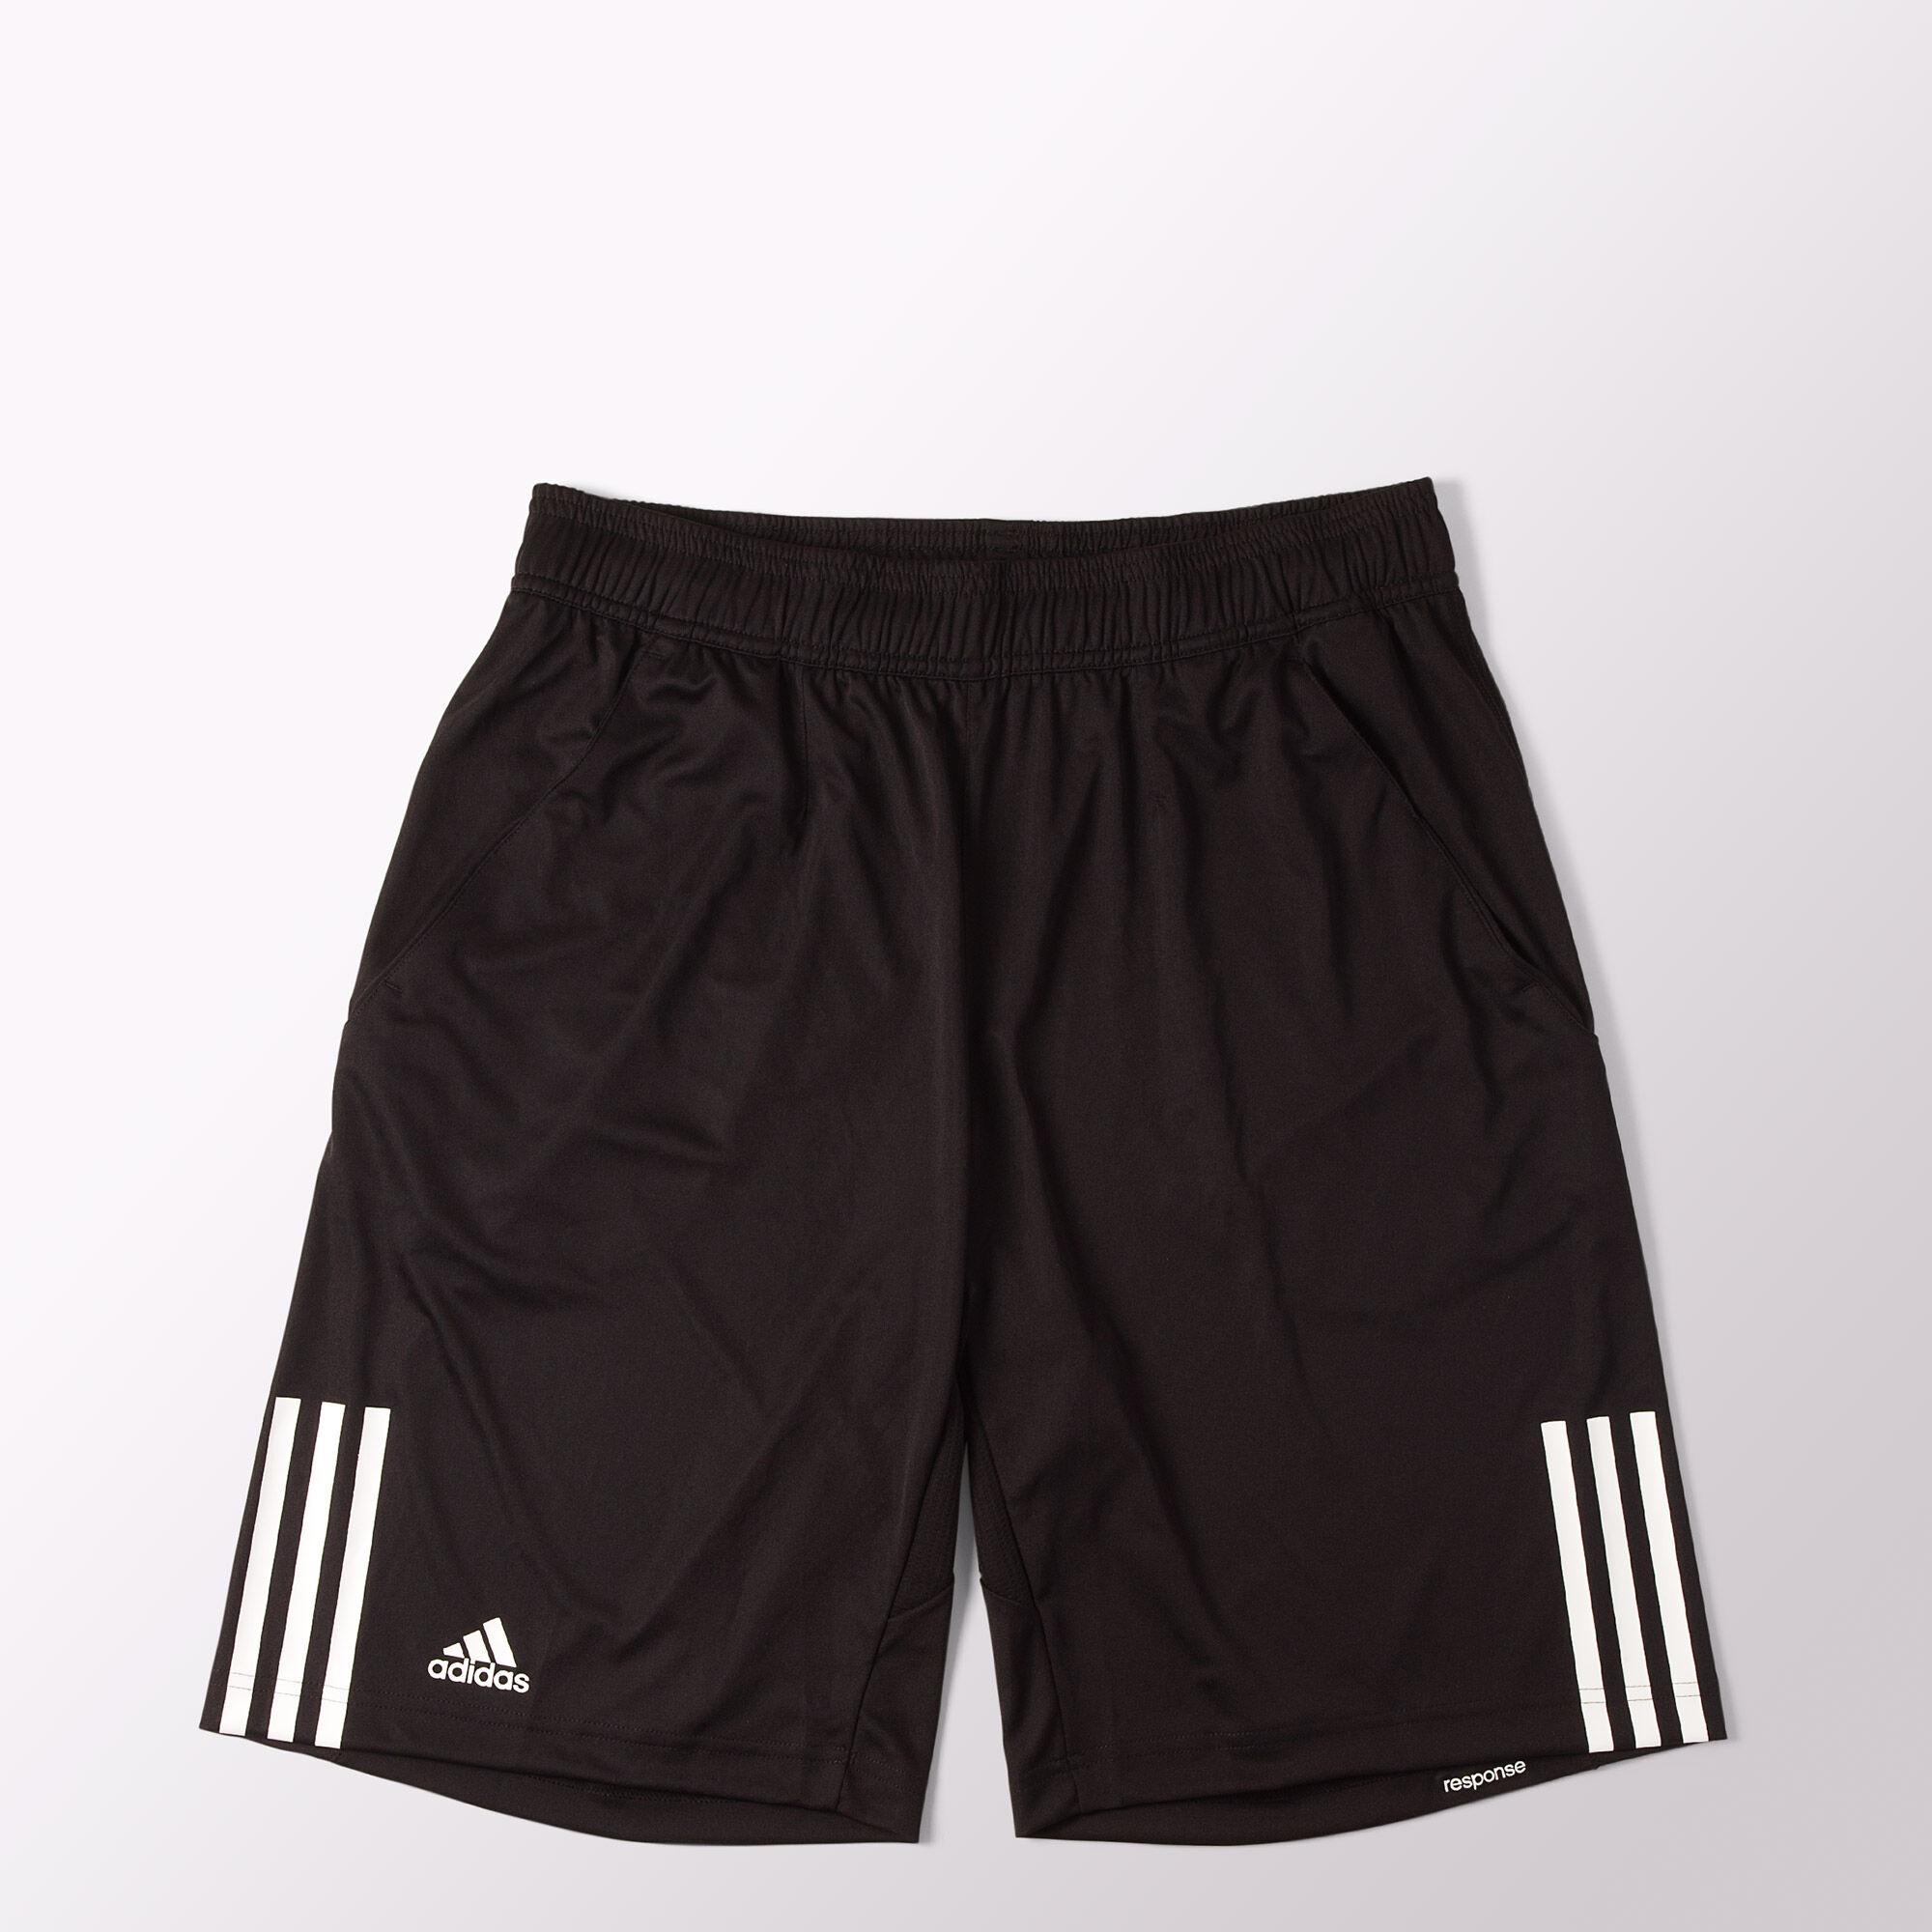 adidas shorts de tennis response bermuda negro adidas mexico. Black Bedroom Furniture Sets. Home Design Ideas